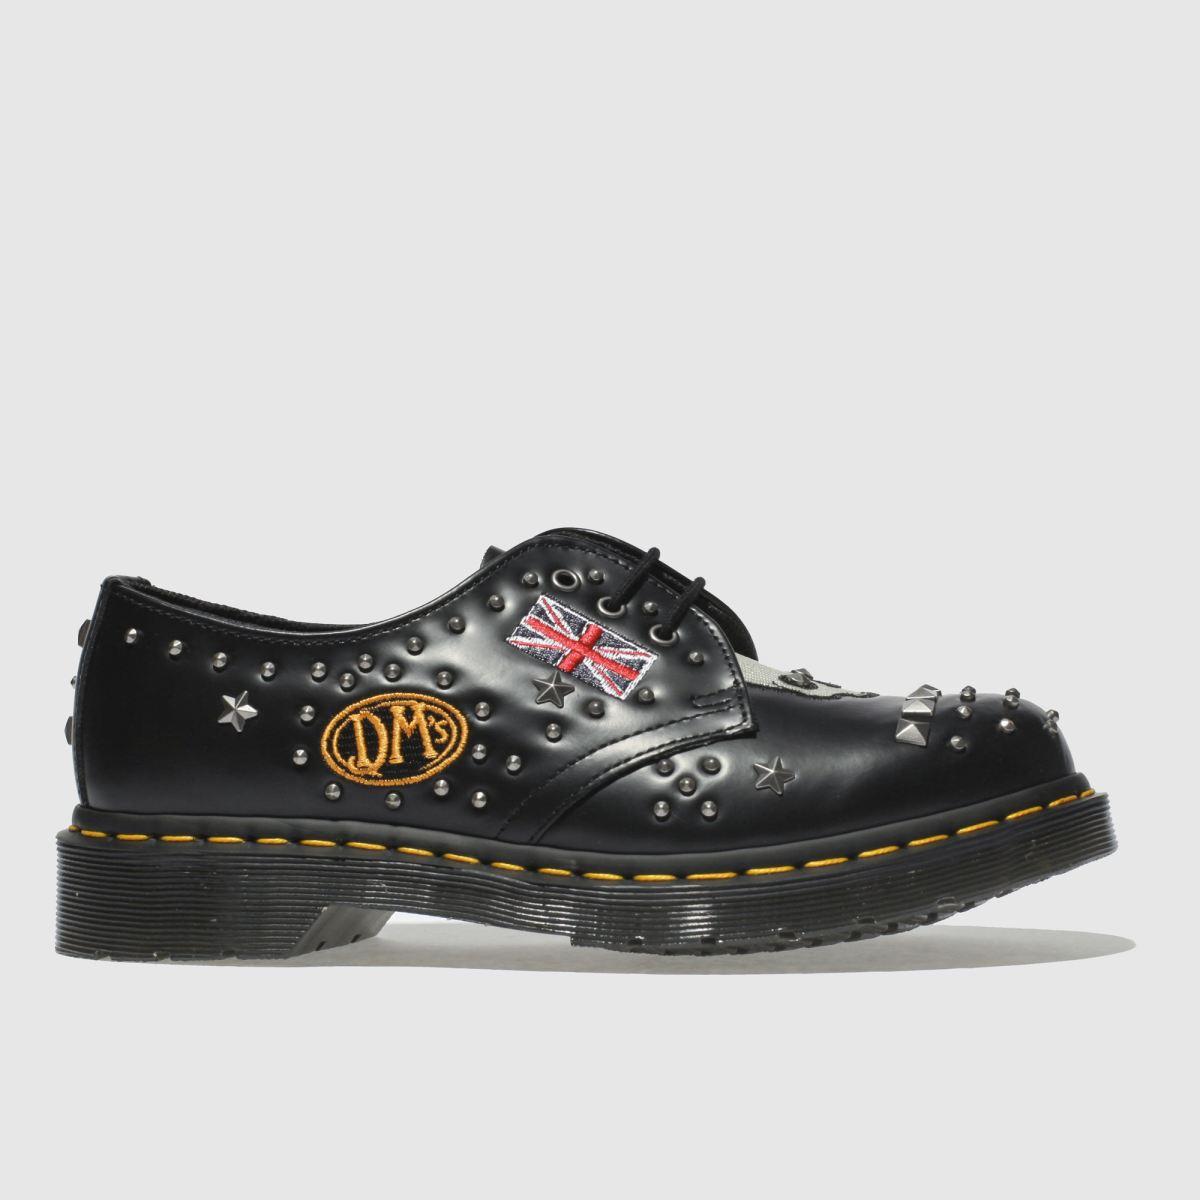 Dr Martens Black & Silver 1461 Rockabilly Flat Shoes